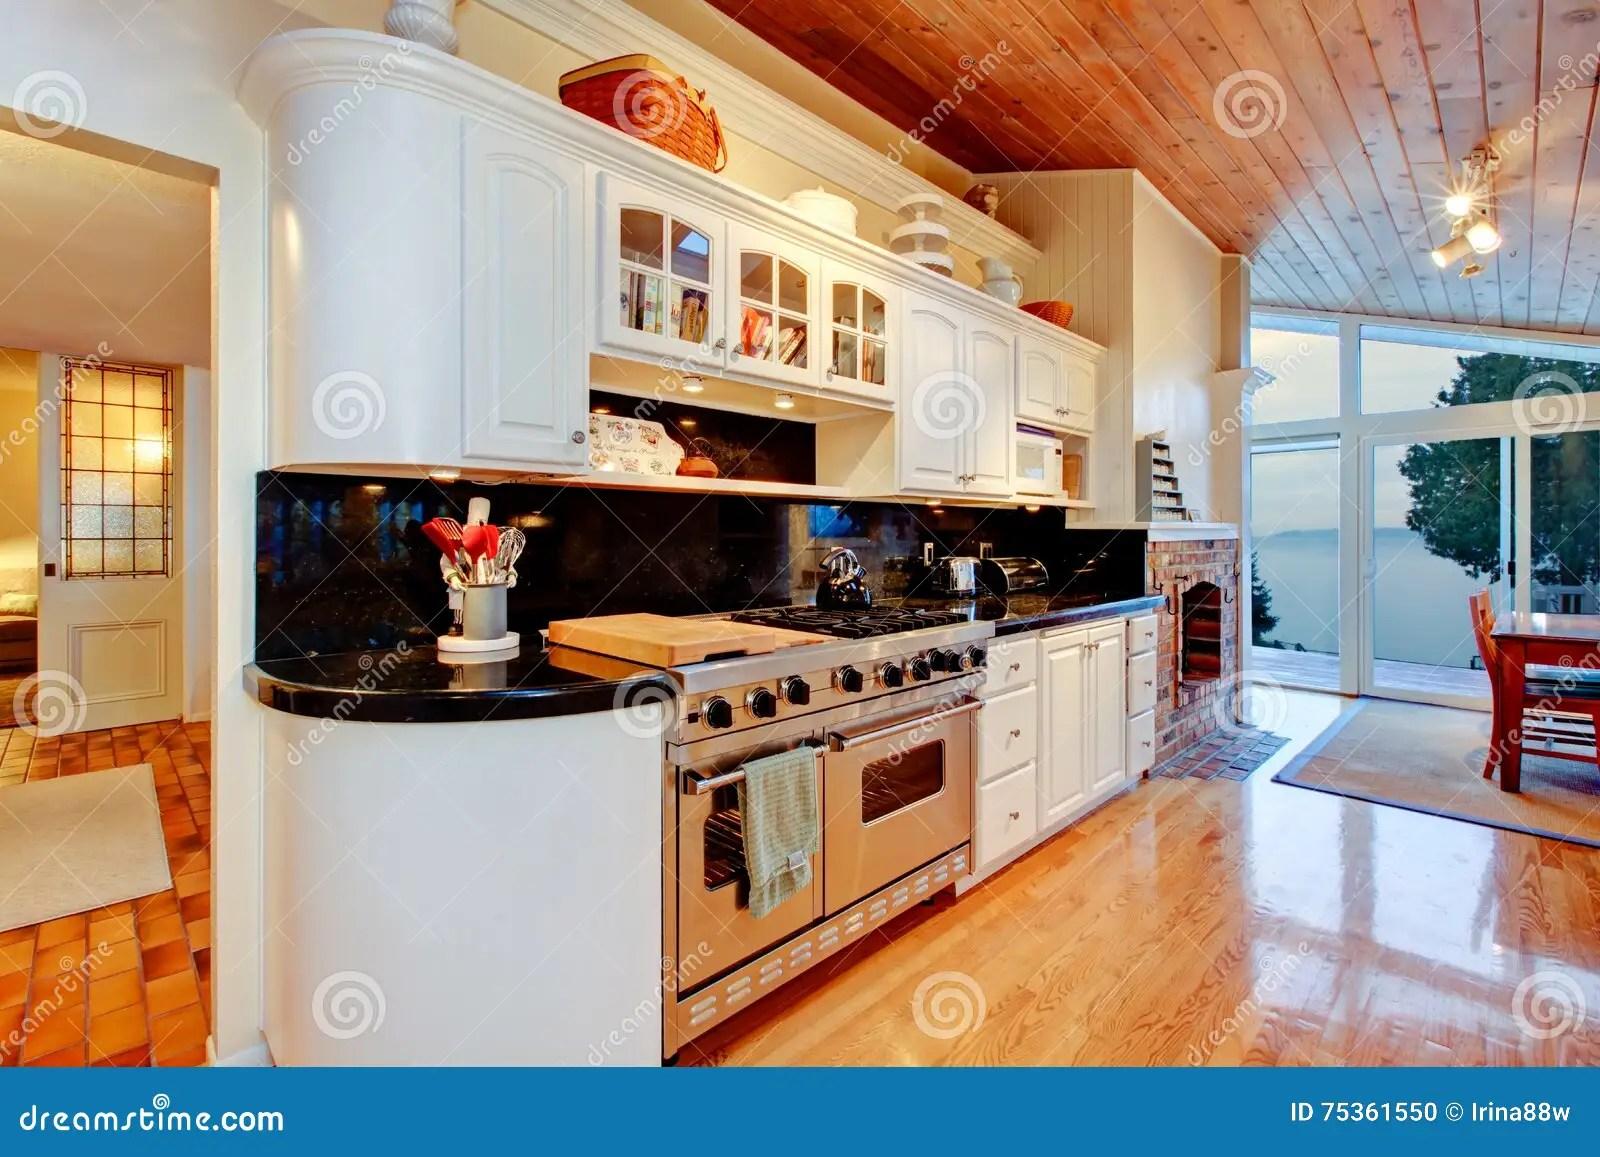 kitchen cabinets ri clothes 有黑桌面的白色厨柜在豪华房子里库存照片 图片包括有水槽 墙壁 机柜 有黑桌面 发光的硬木地板和木天花板的白色厨柜与在豪华房子内部的天窗西北 美国